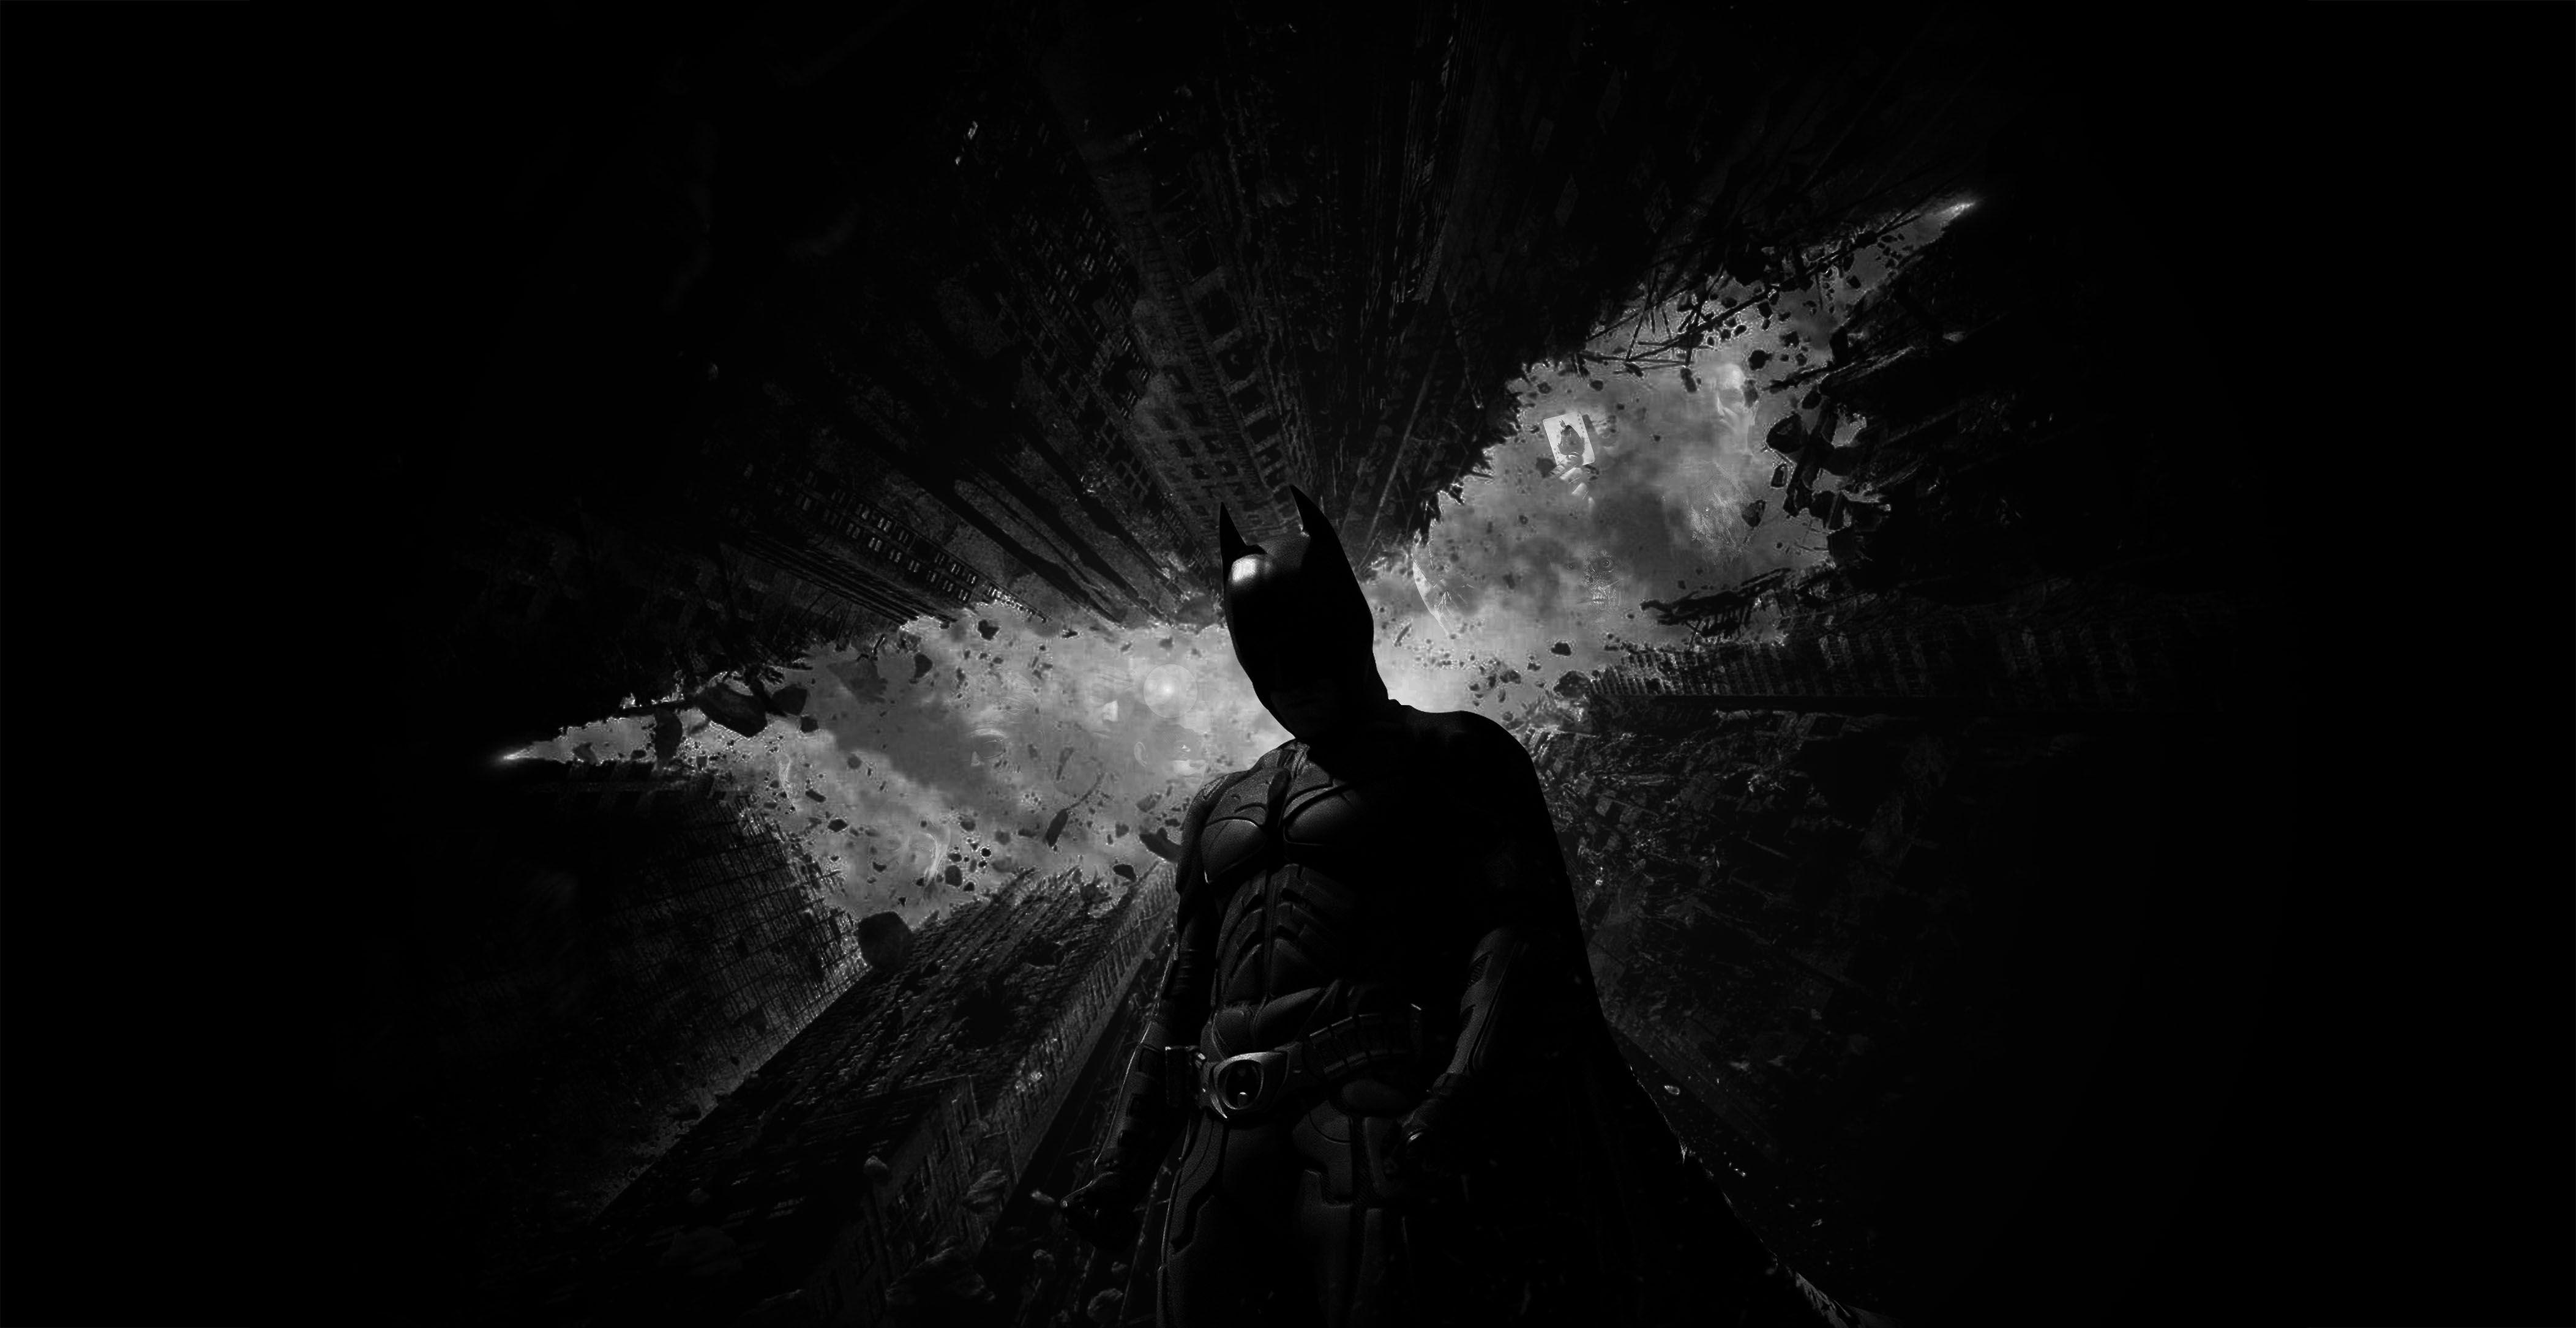 Dark Knight Hd Wallpapers Top Free Dark Knight Hd Backgrounds Wallpaperaccess